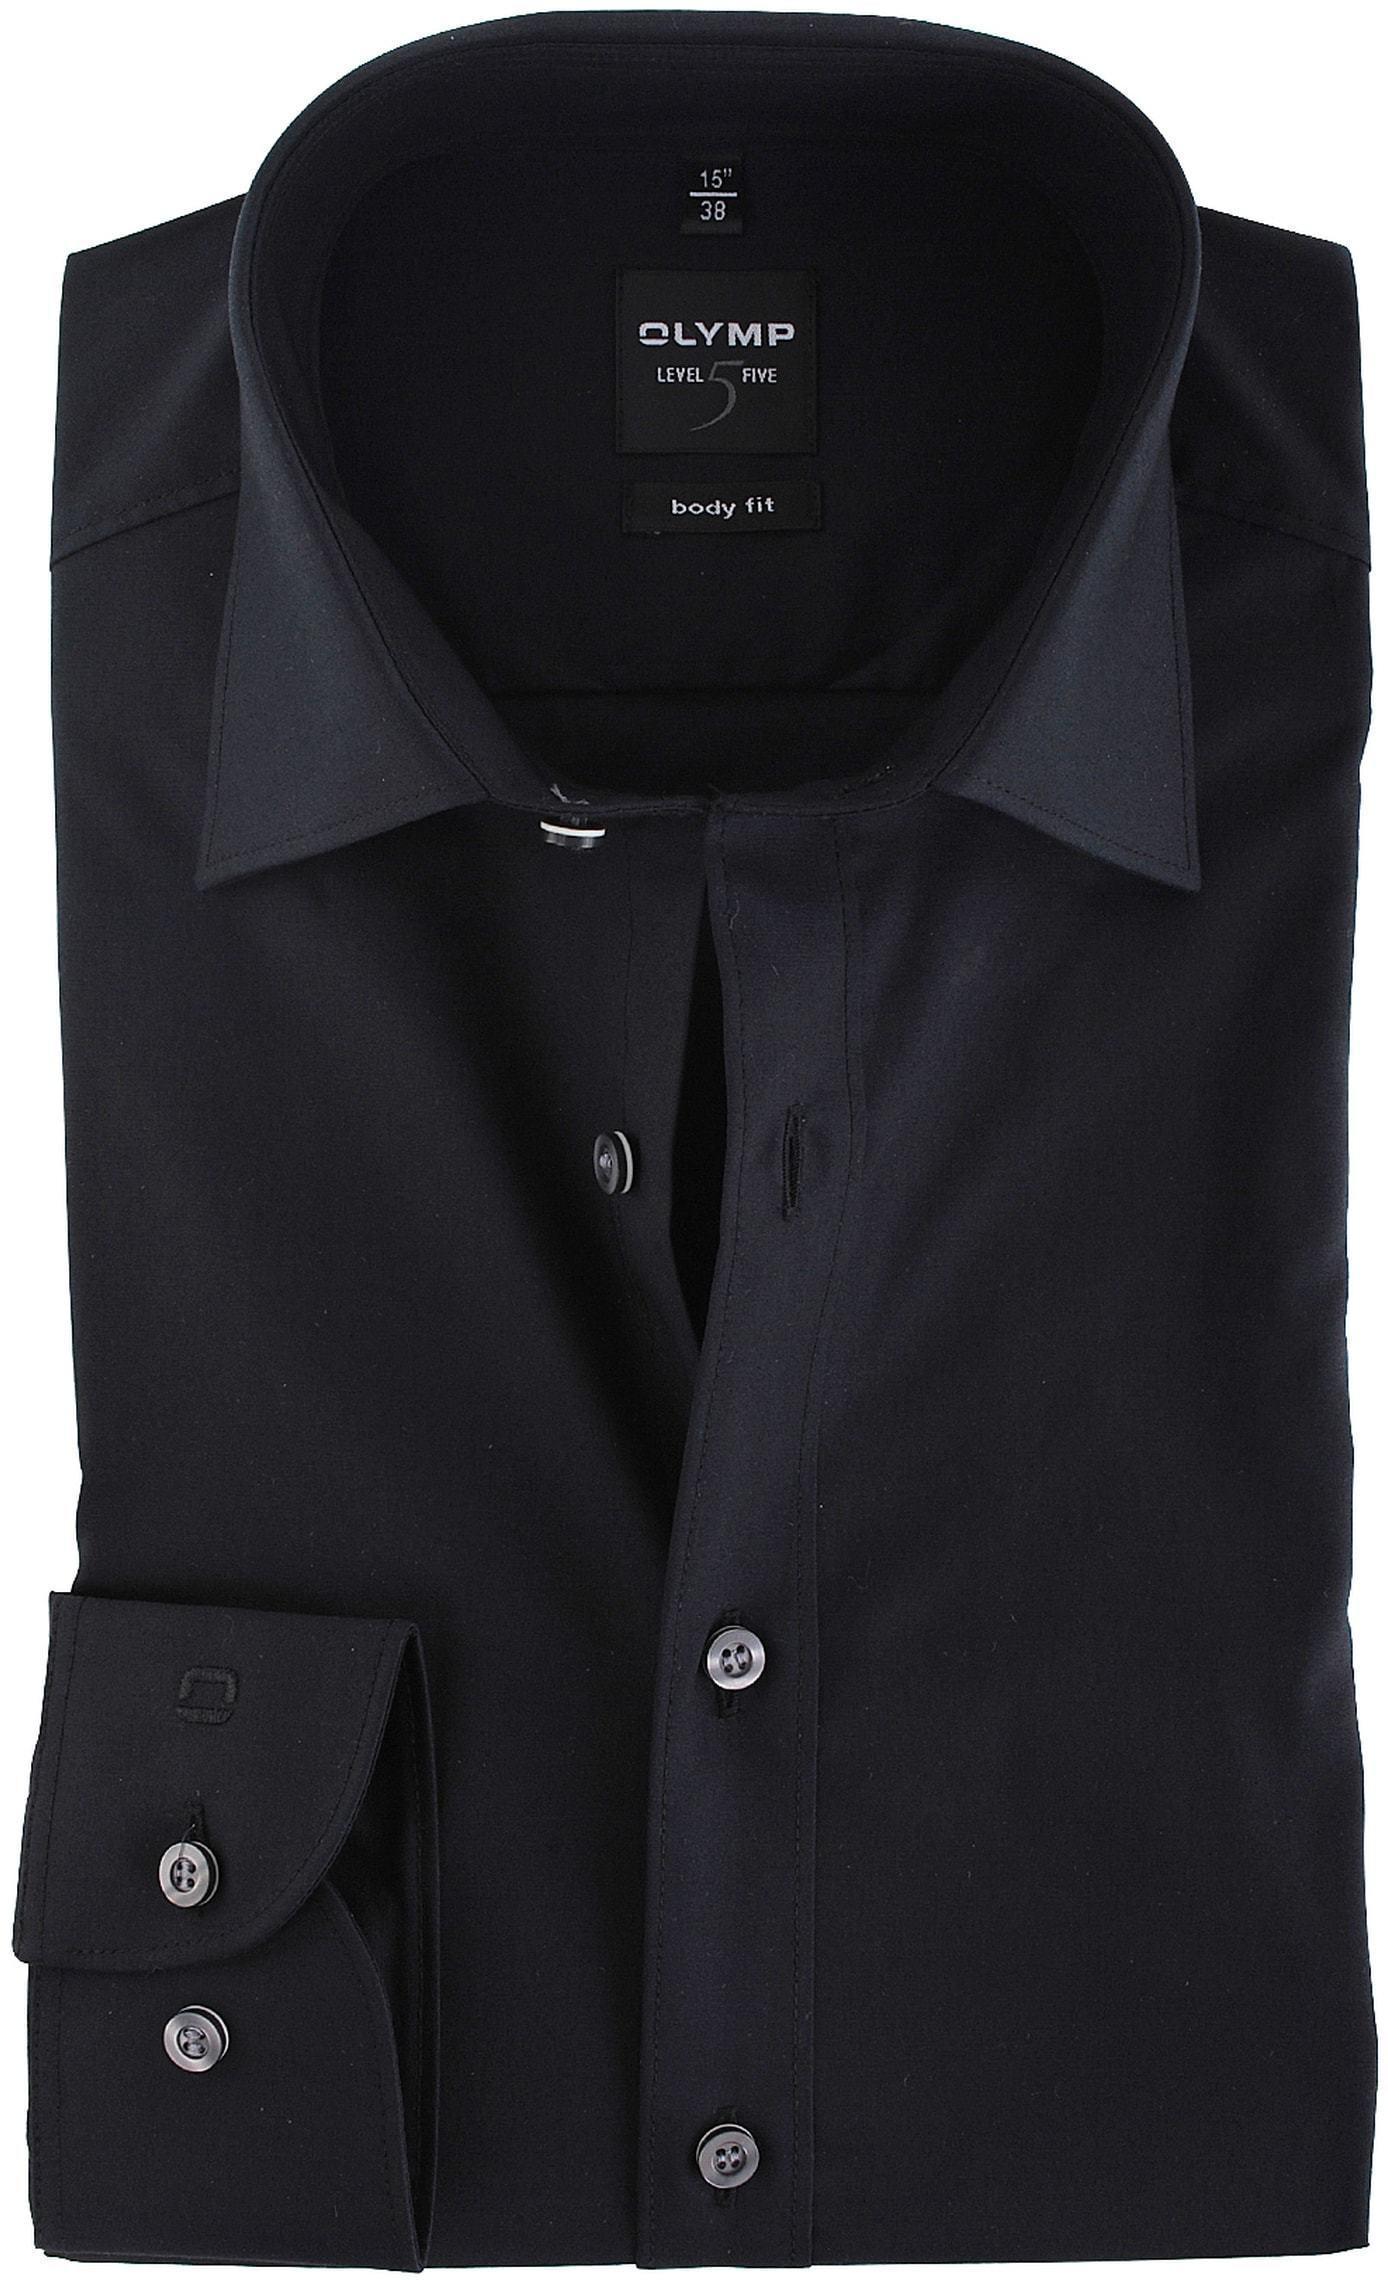 Olymp Level Five Shirt Body-Fit Black foto 0